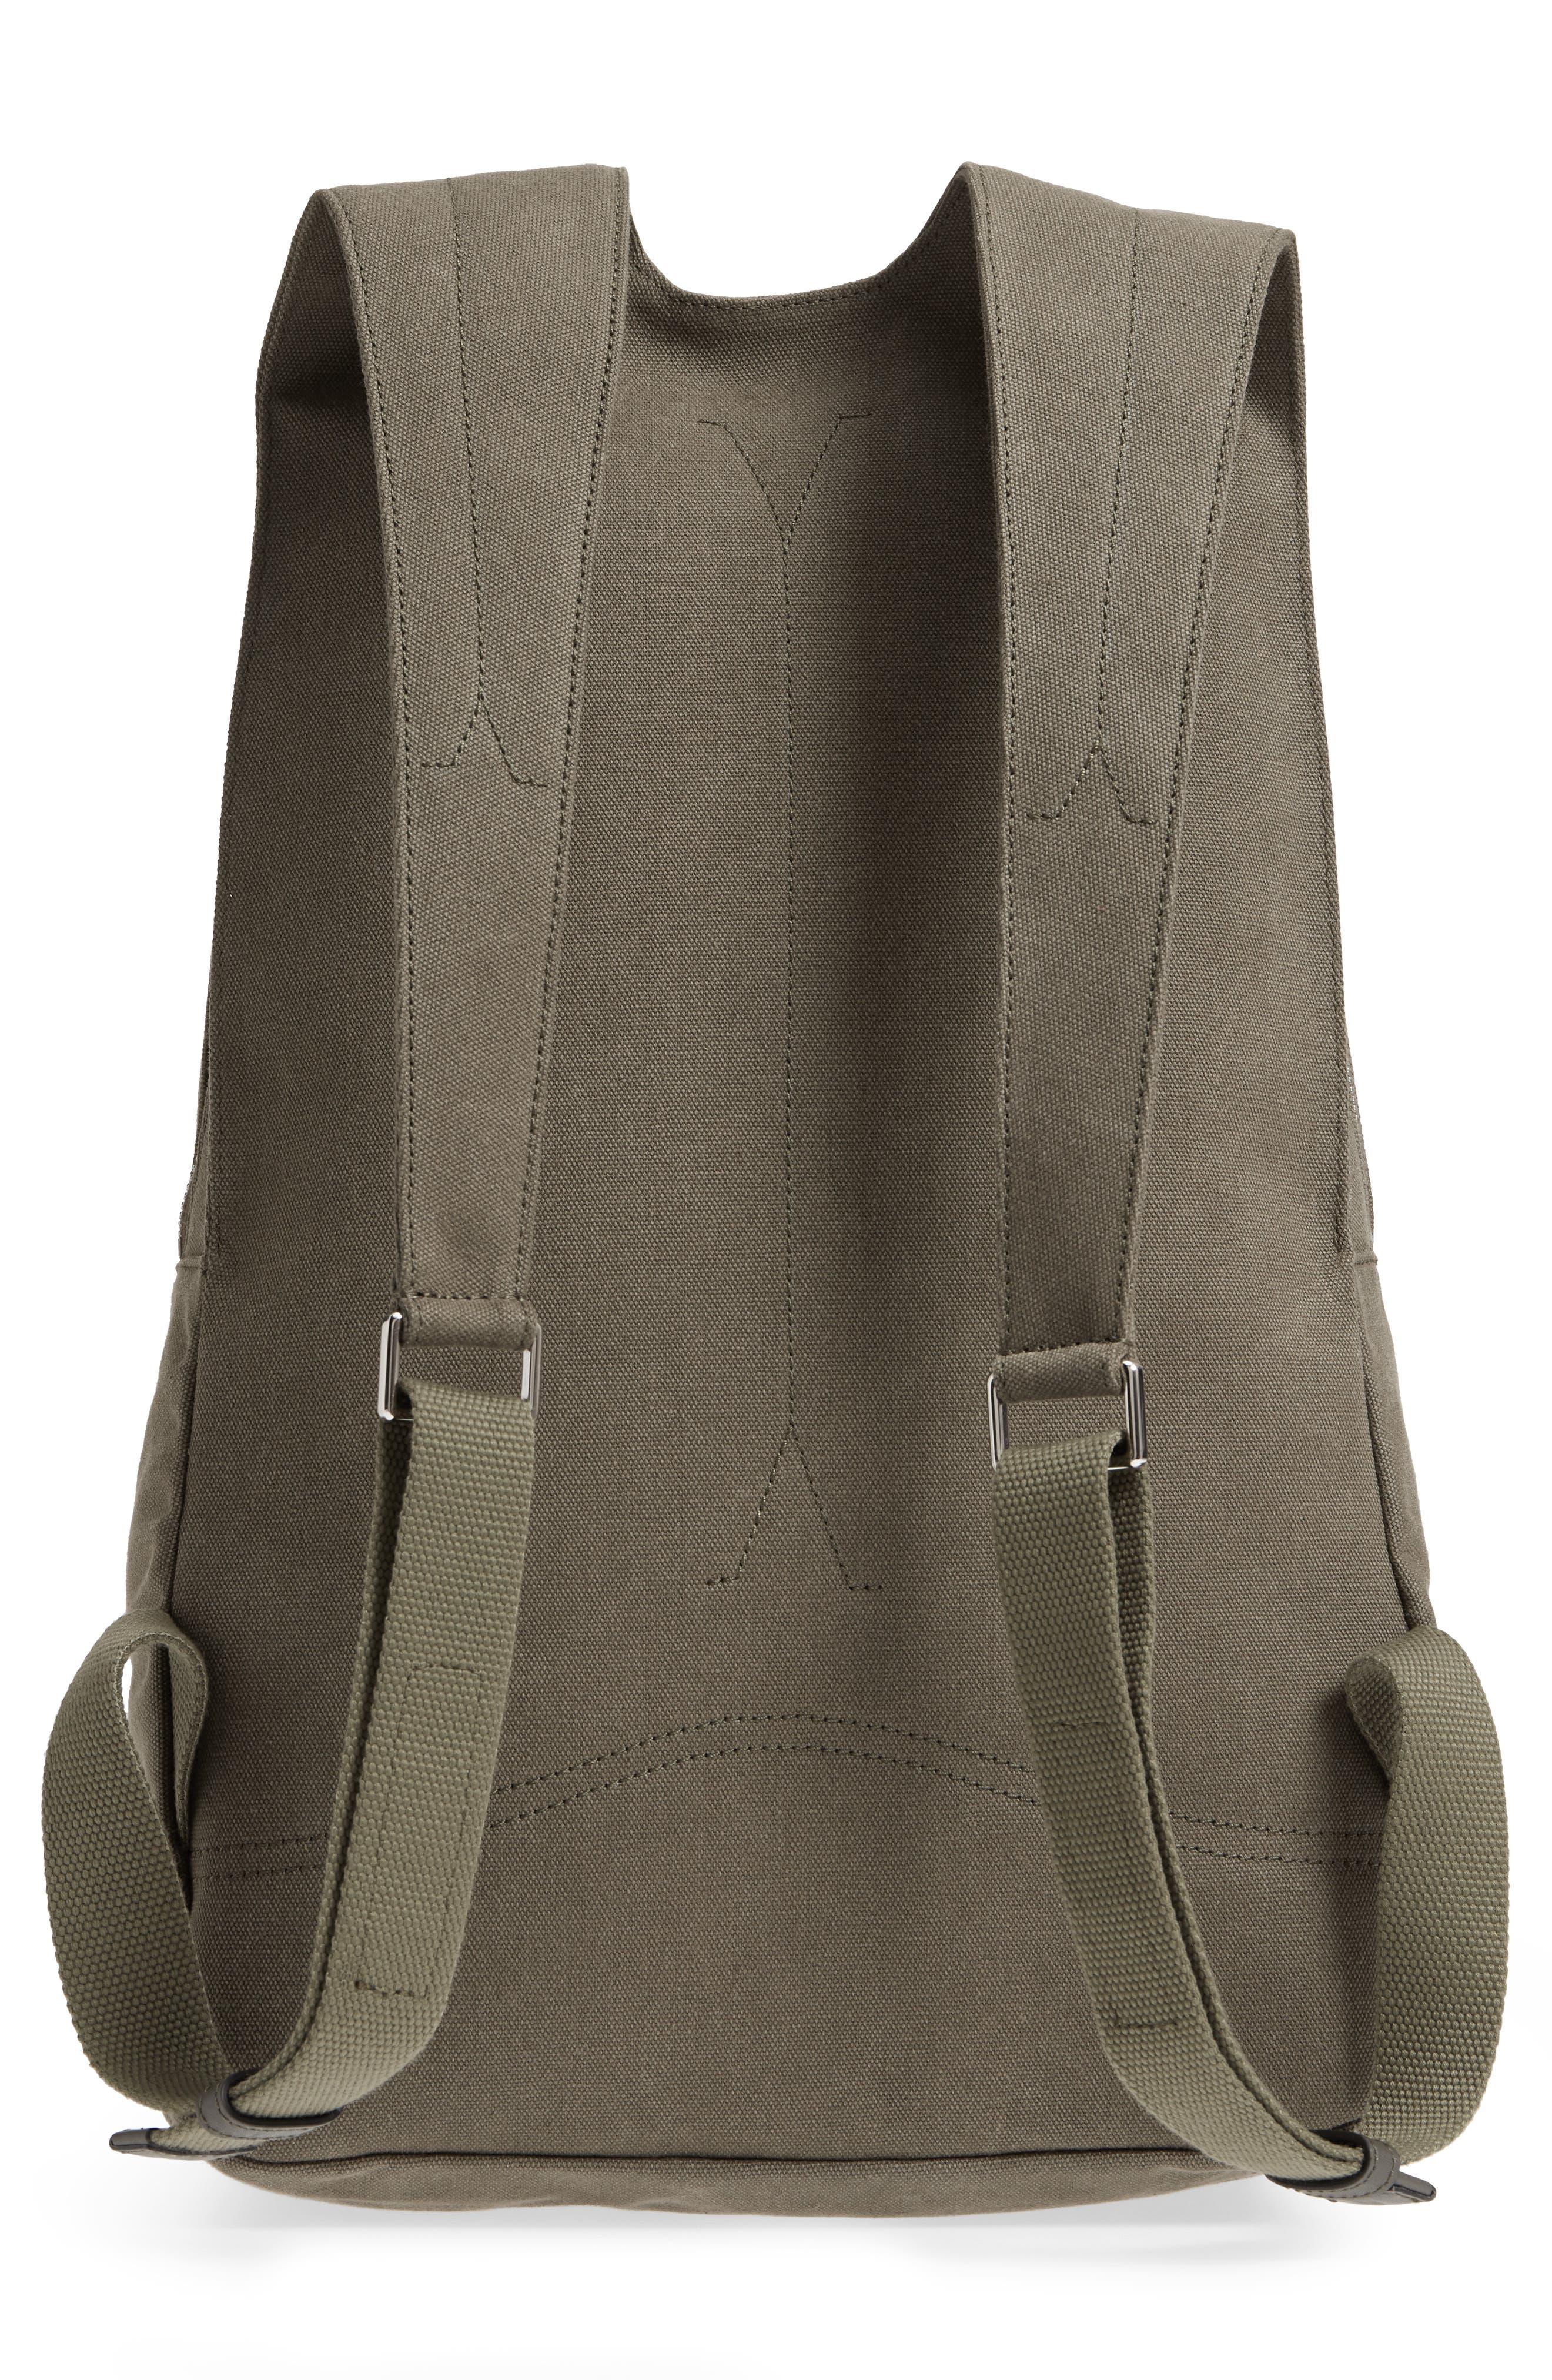 GARAVANI Canvas Military Backpack,                             Alternate thumbnail 3, color,                             L90 Olive